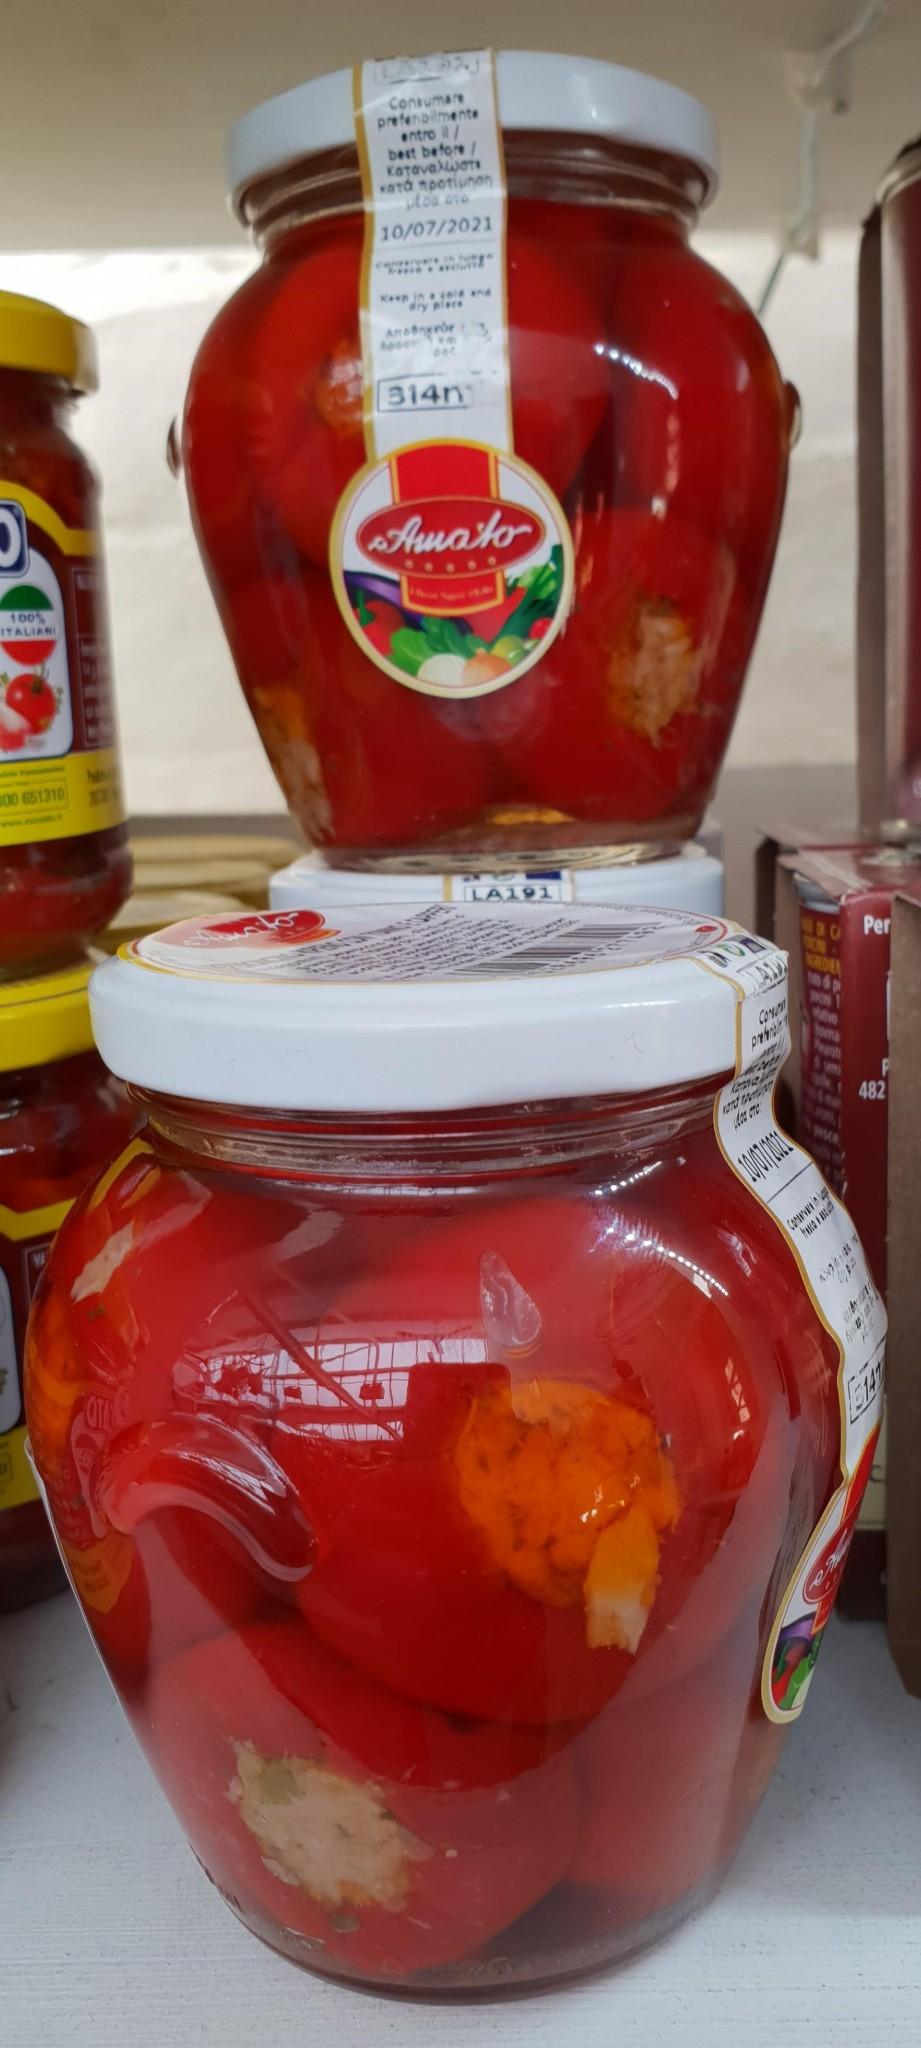 Amato Traditional Tuna stuffed Calabrian Chillies 314g jar